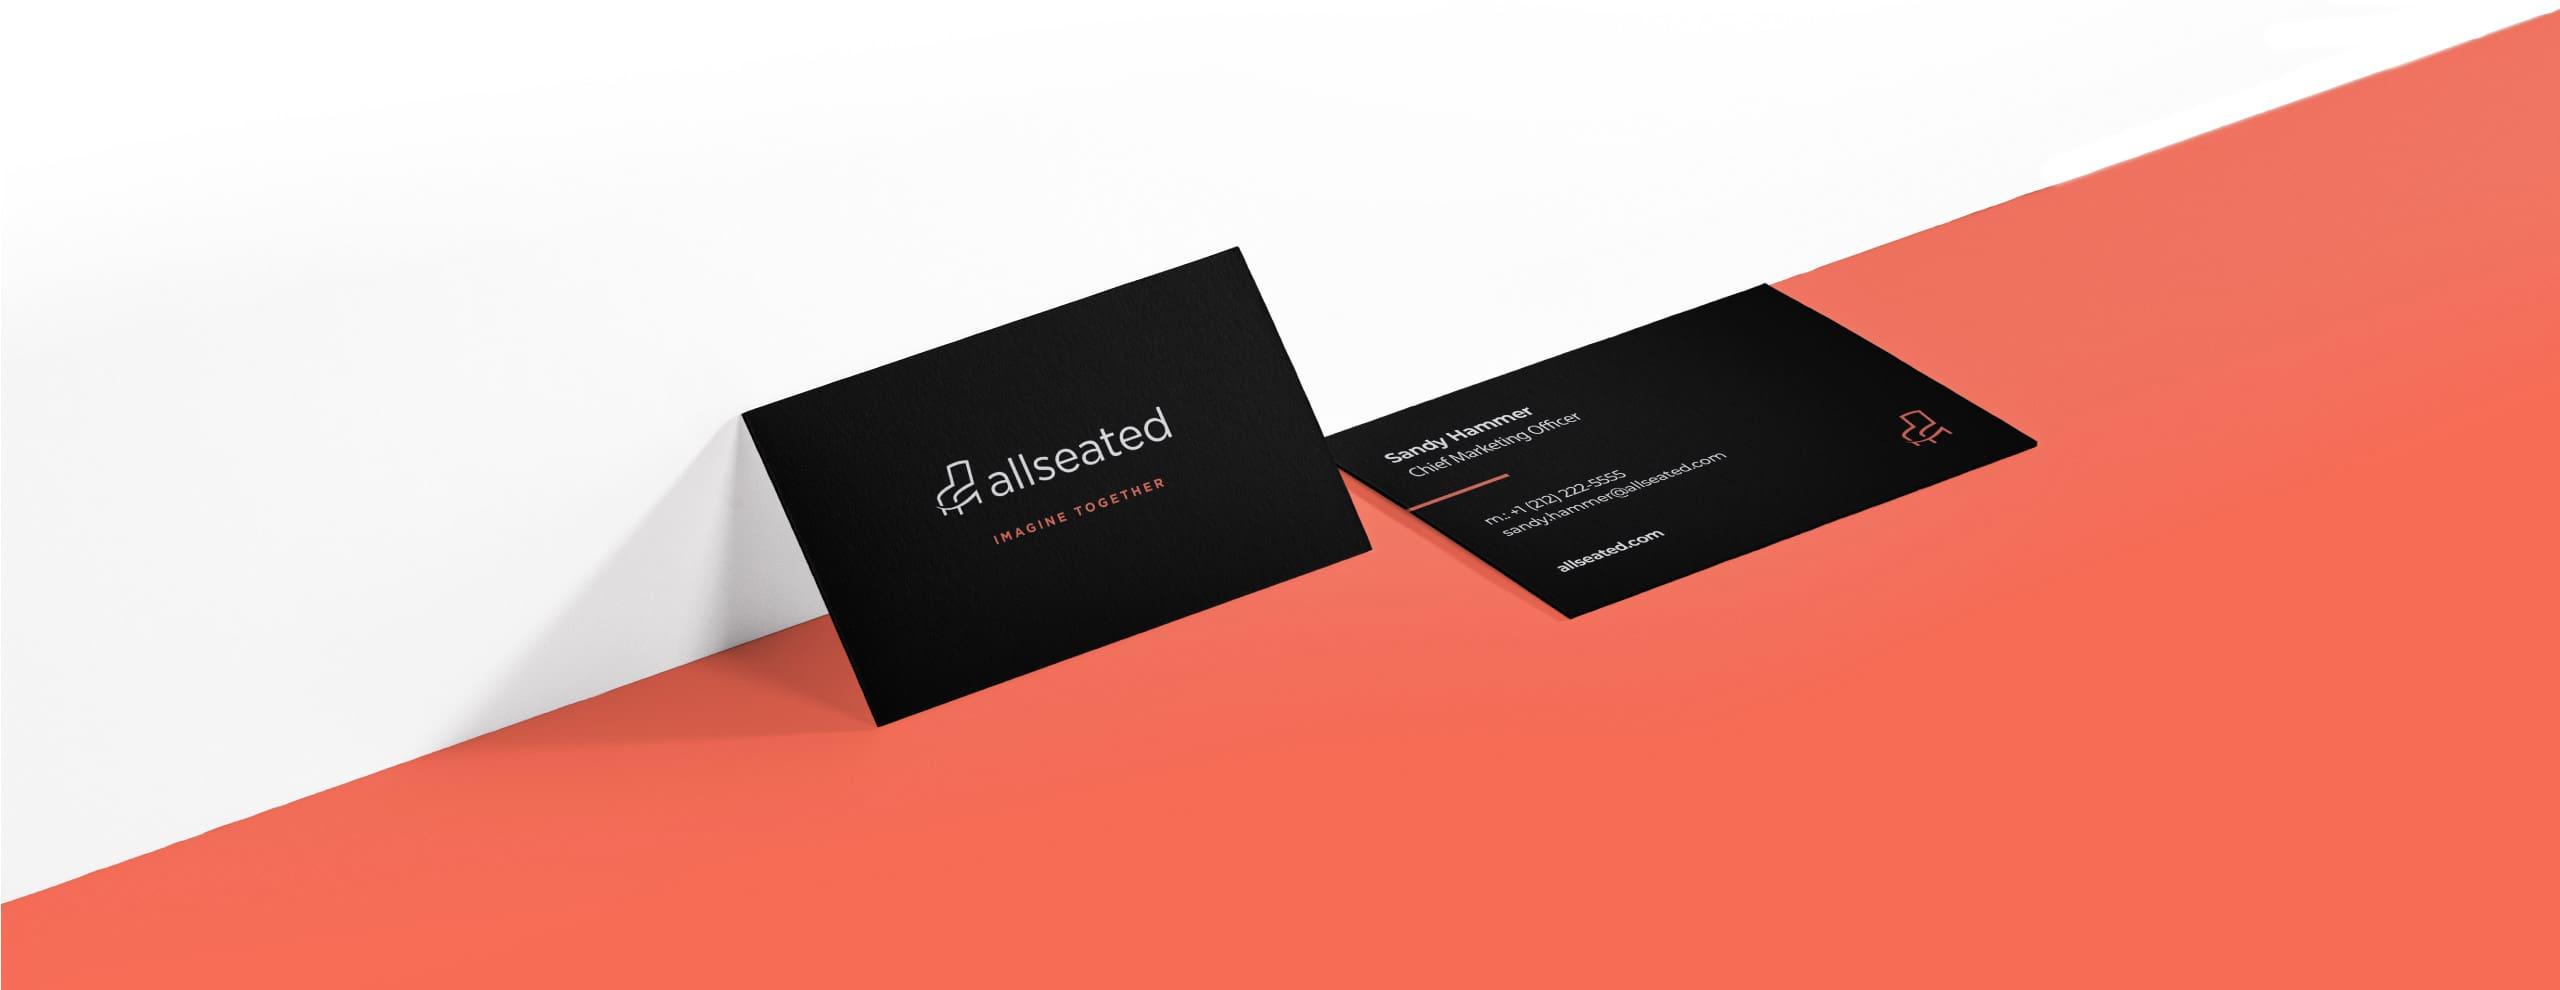 Allseated - AllSeated_2_eventplanning - Natie Branding Agency